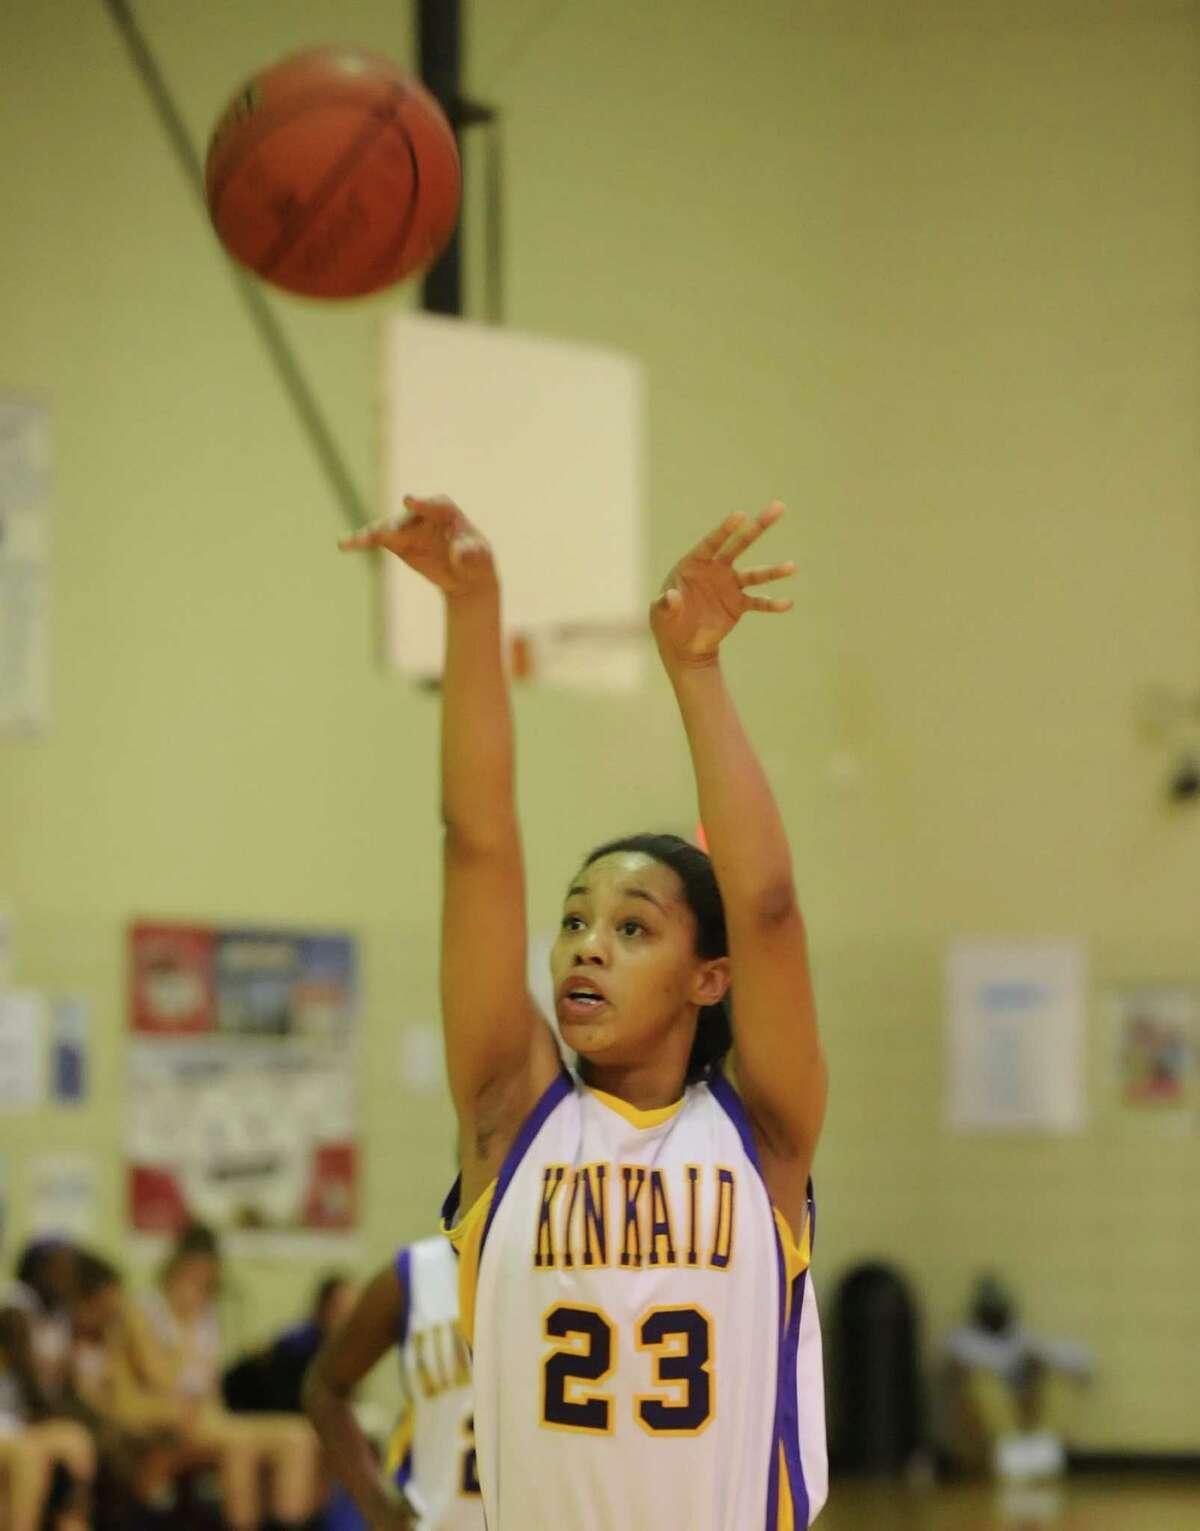 Kinkaid girls basketball team defeated Lamar's girls team, 81-47, at Lamar High School, 11-5-2013. Kinkaid's Alexis Johnson (23) scored on this free throw.